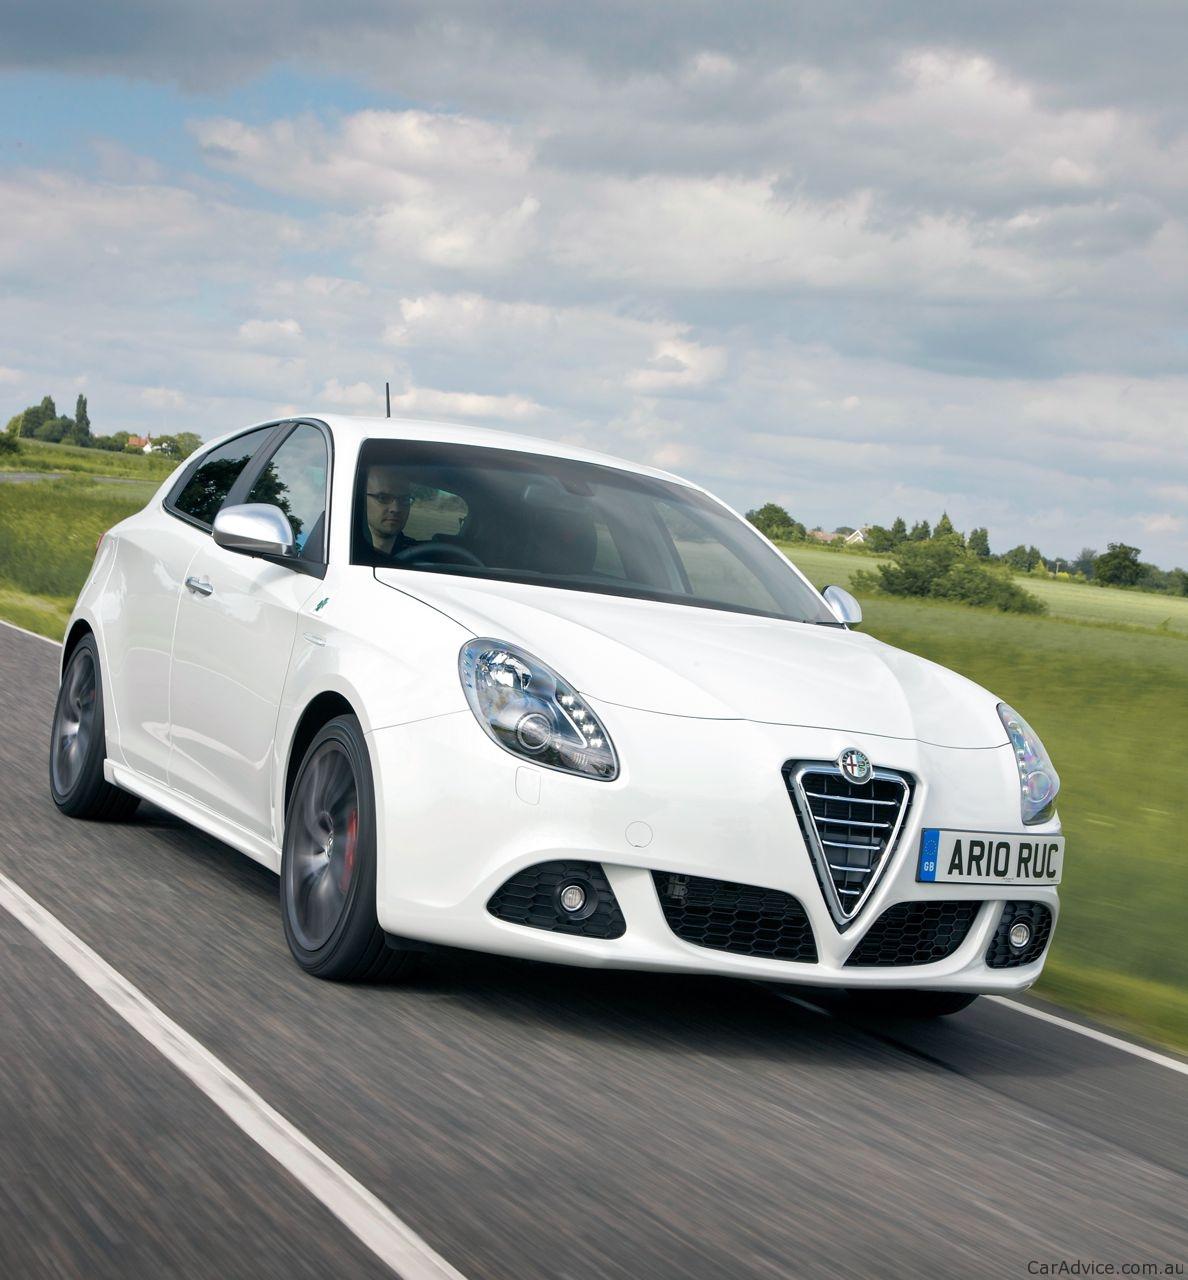 2010 Alfa Romeo Giulietta Review - Photos